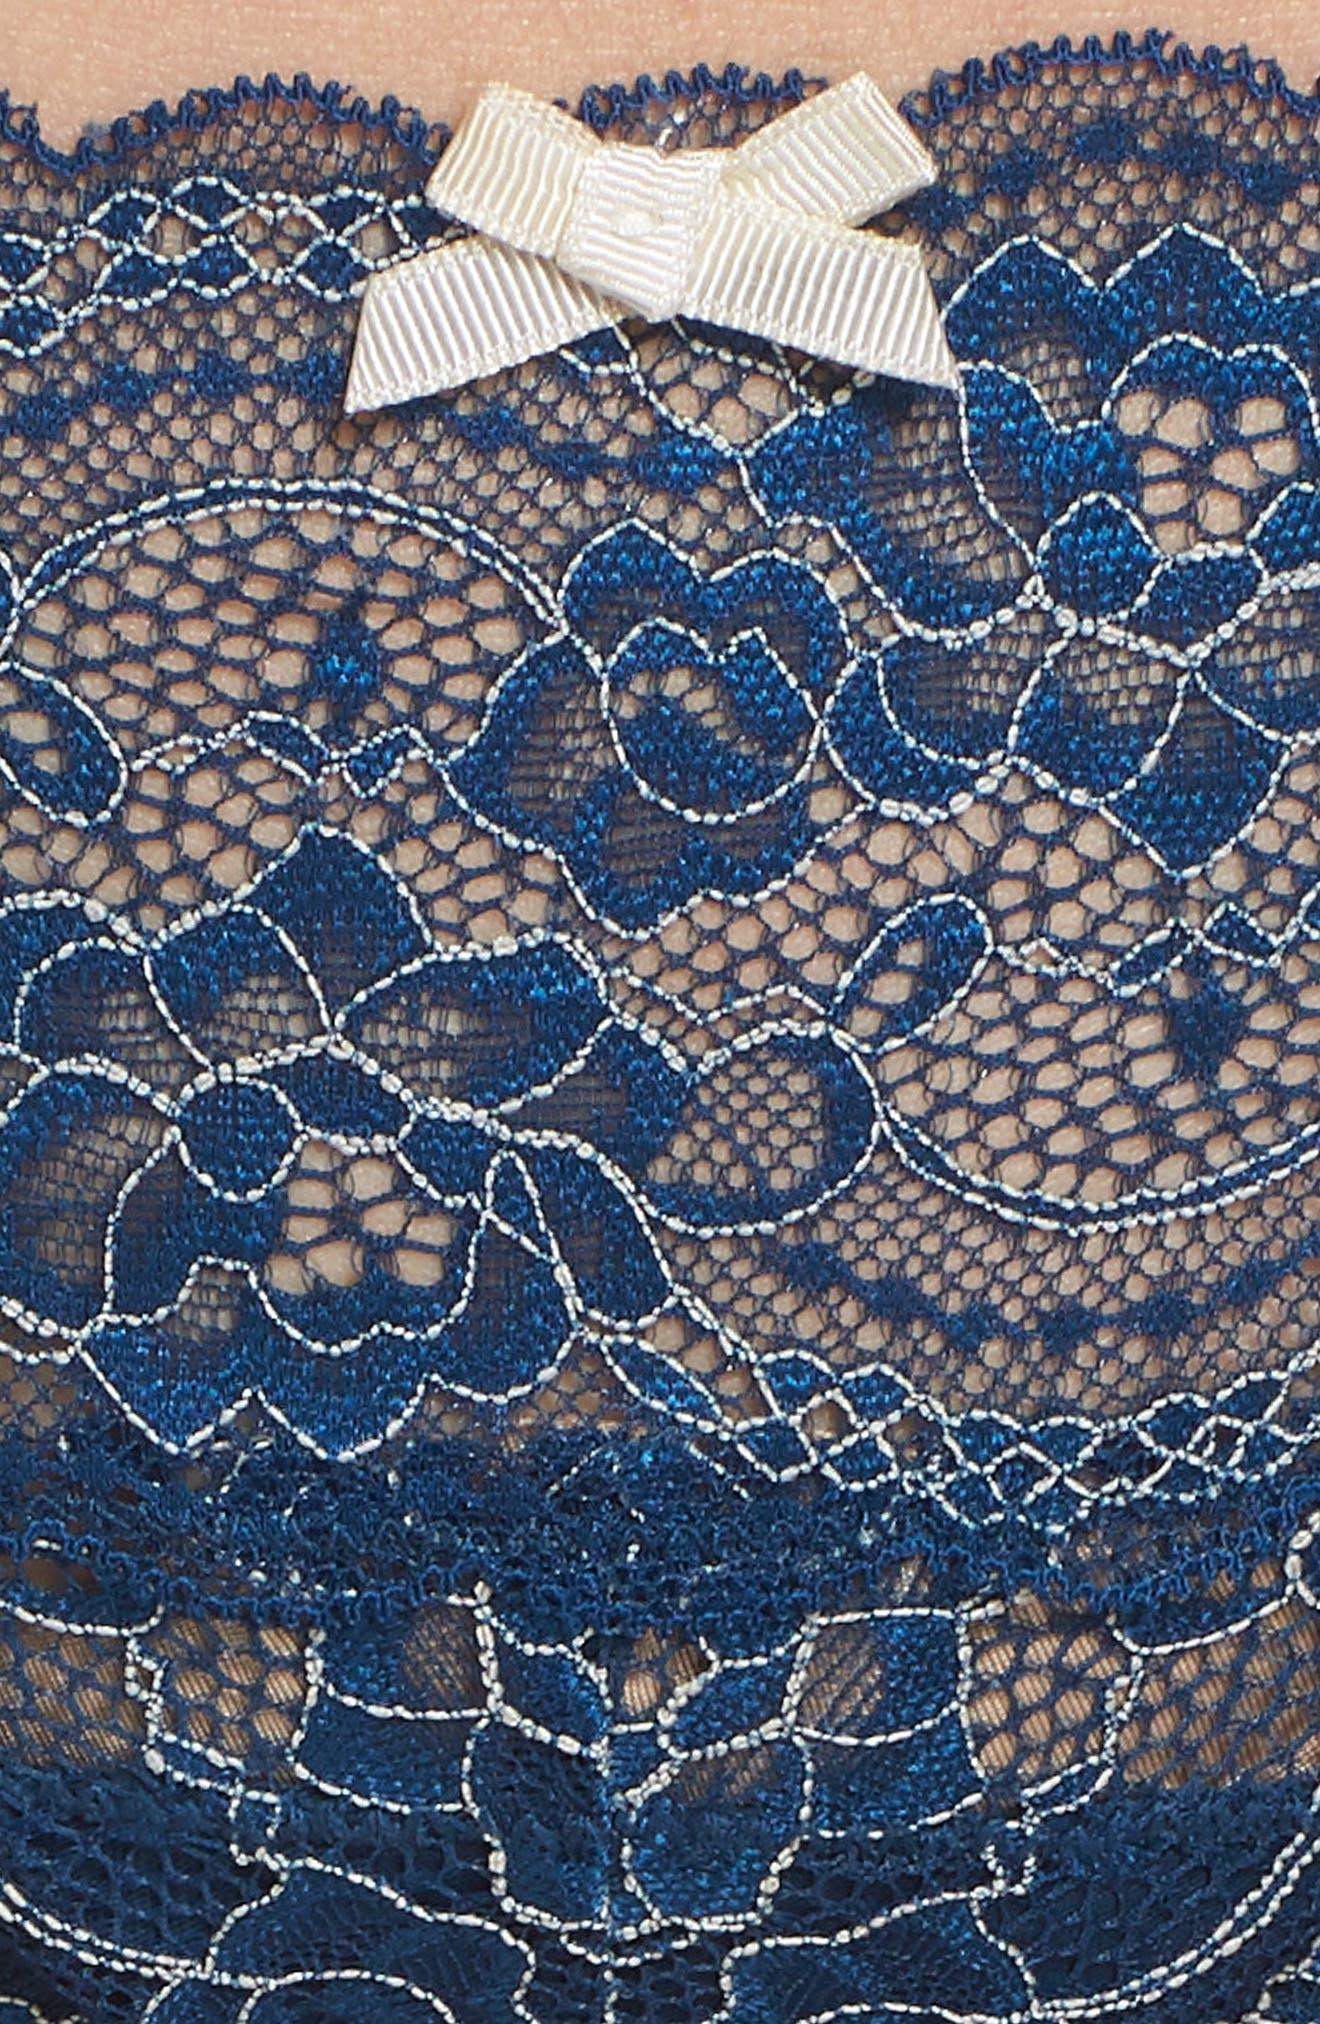 'Obsessed' Lace Thong,                             Alternate thumbnail 3, color,                             Aqua Marine/ Sea Shell